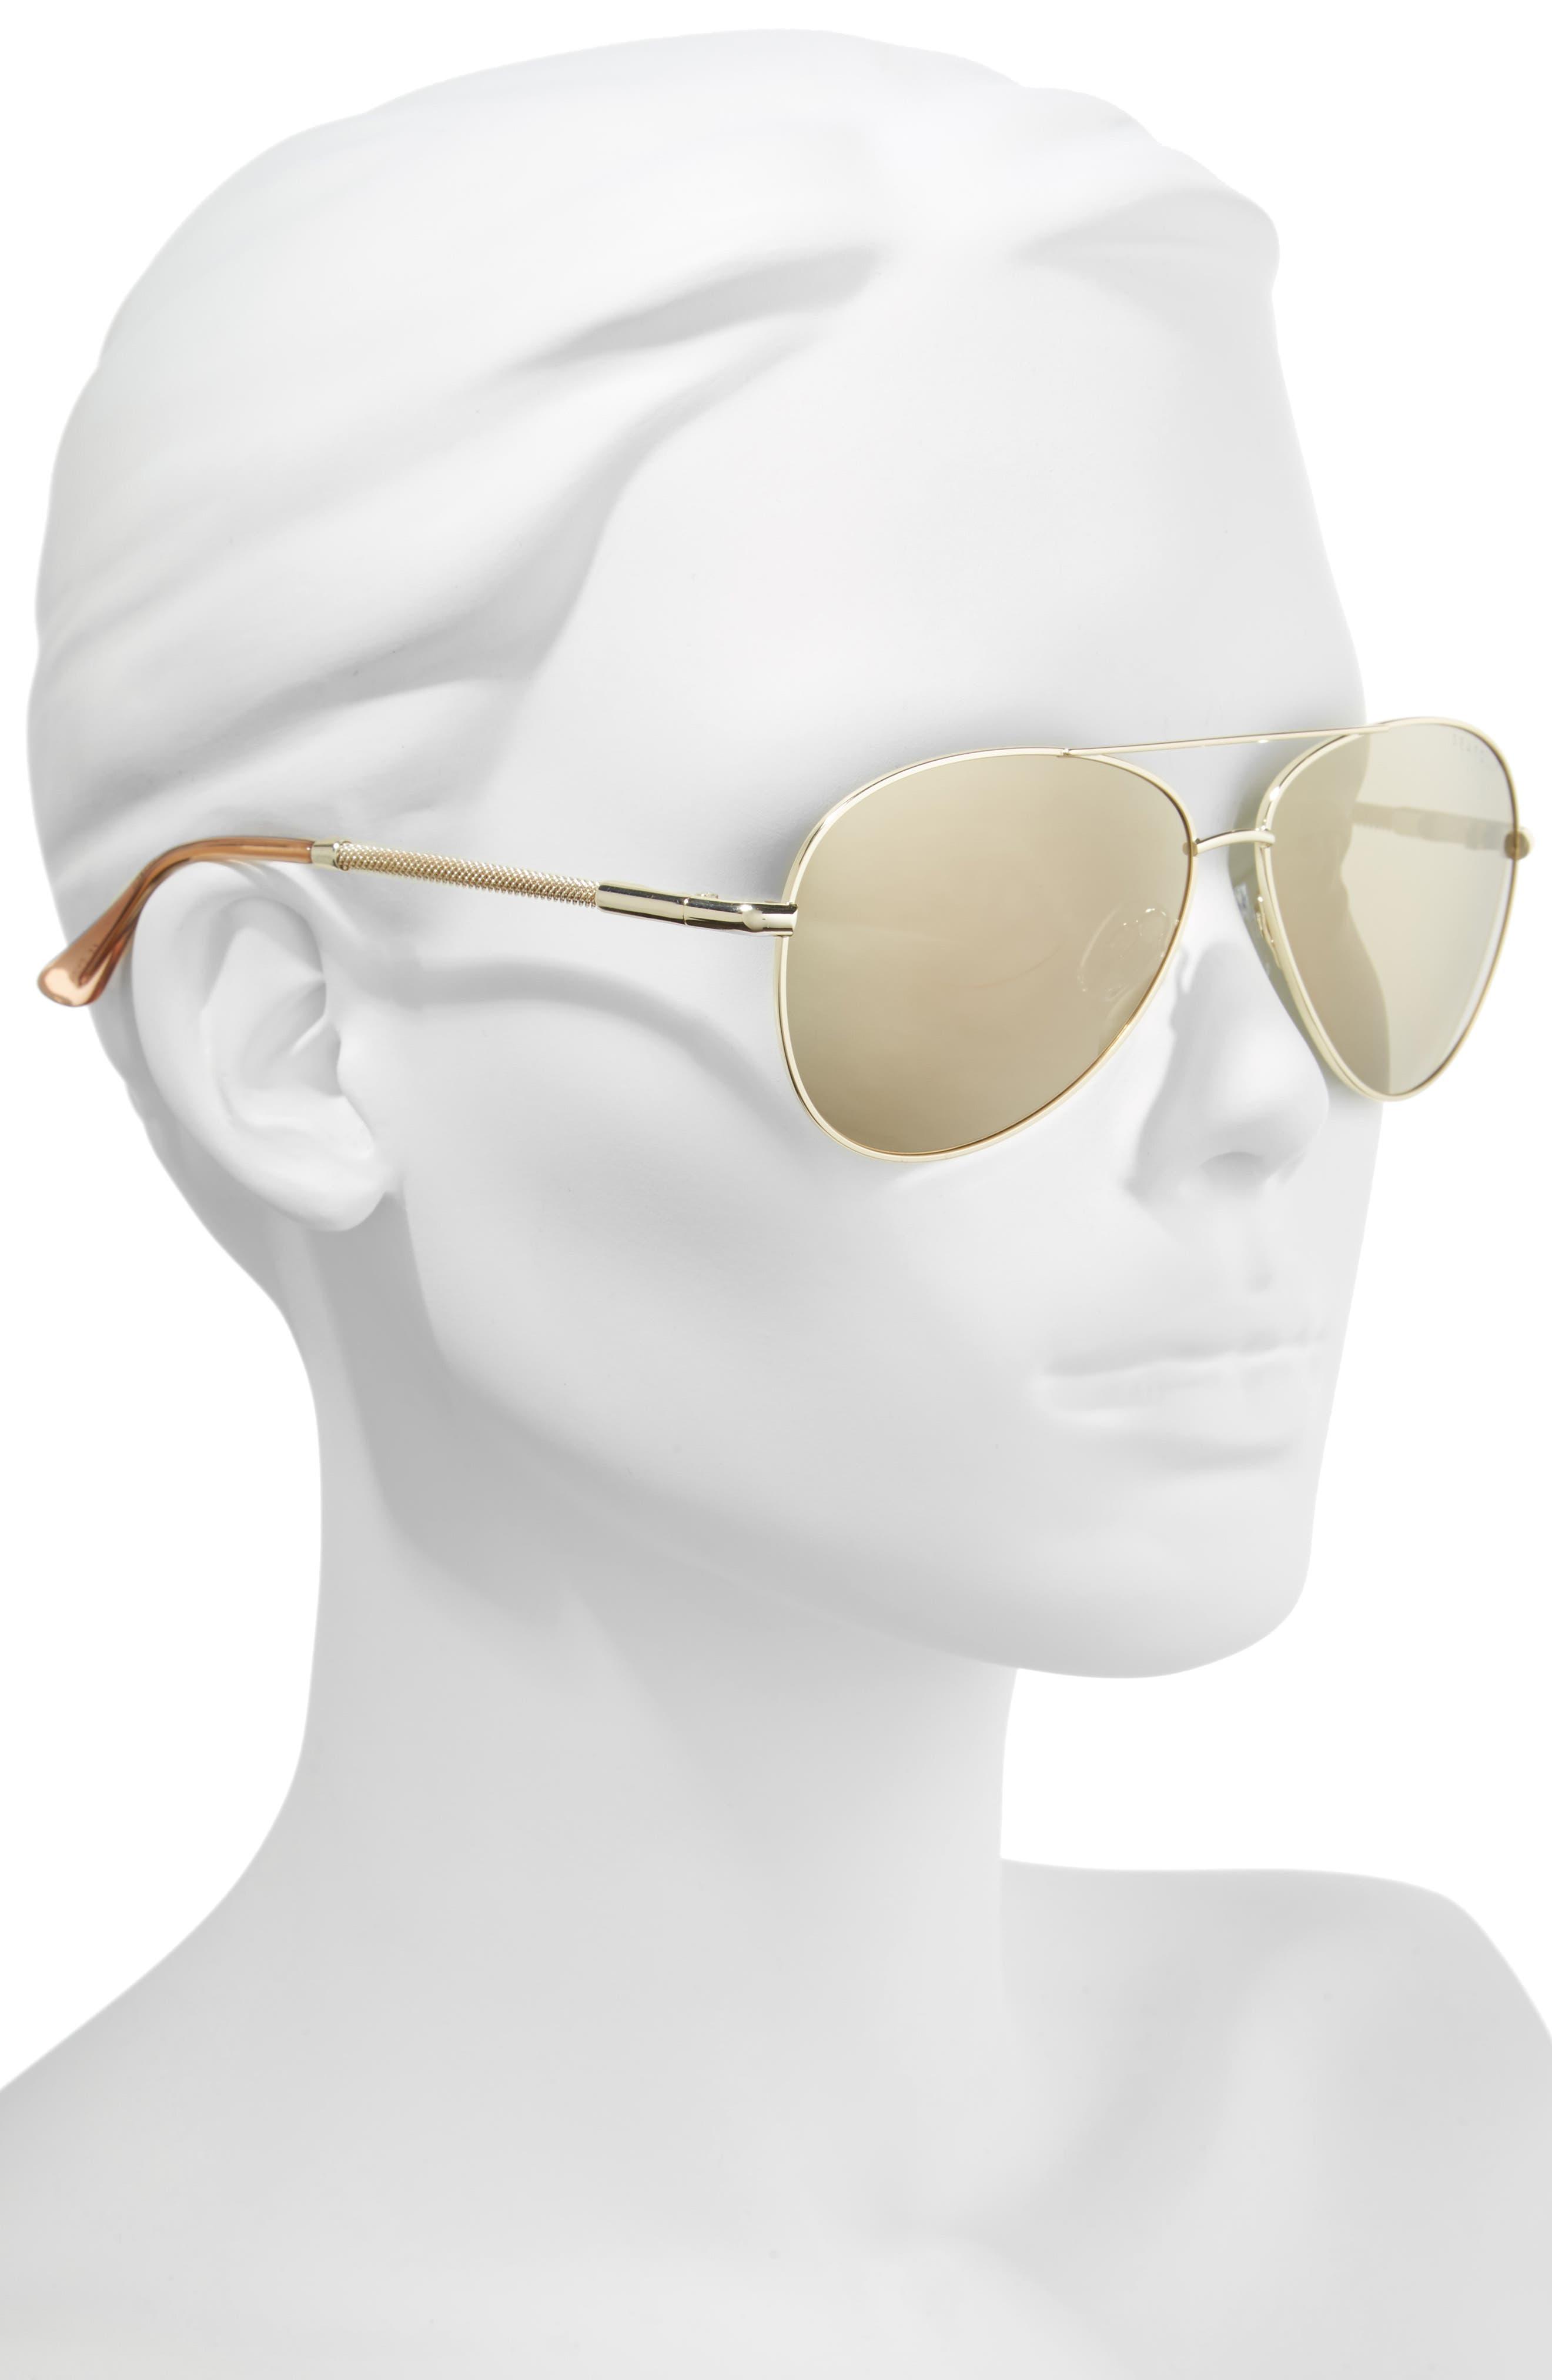 Belize 59mm Aviator Sunglasses,                             Alternate thumbnail 2, color,